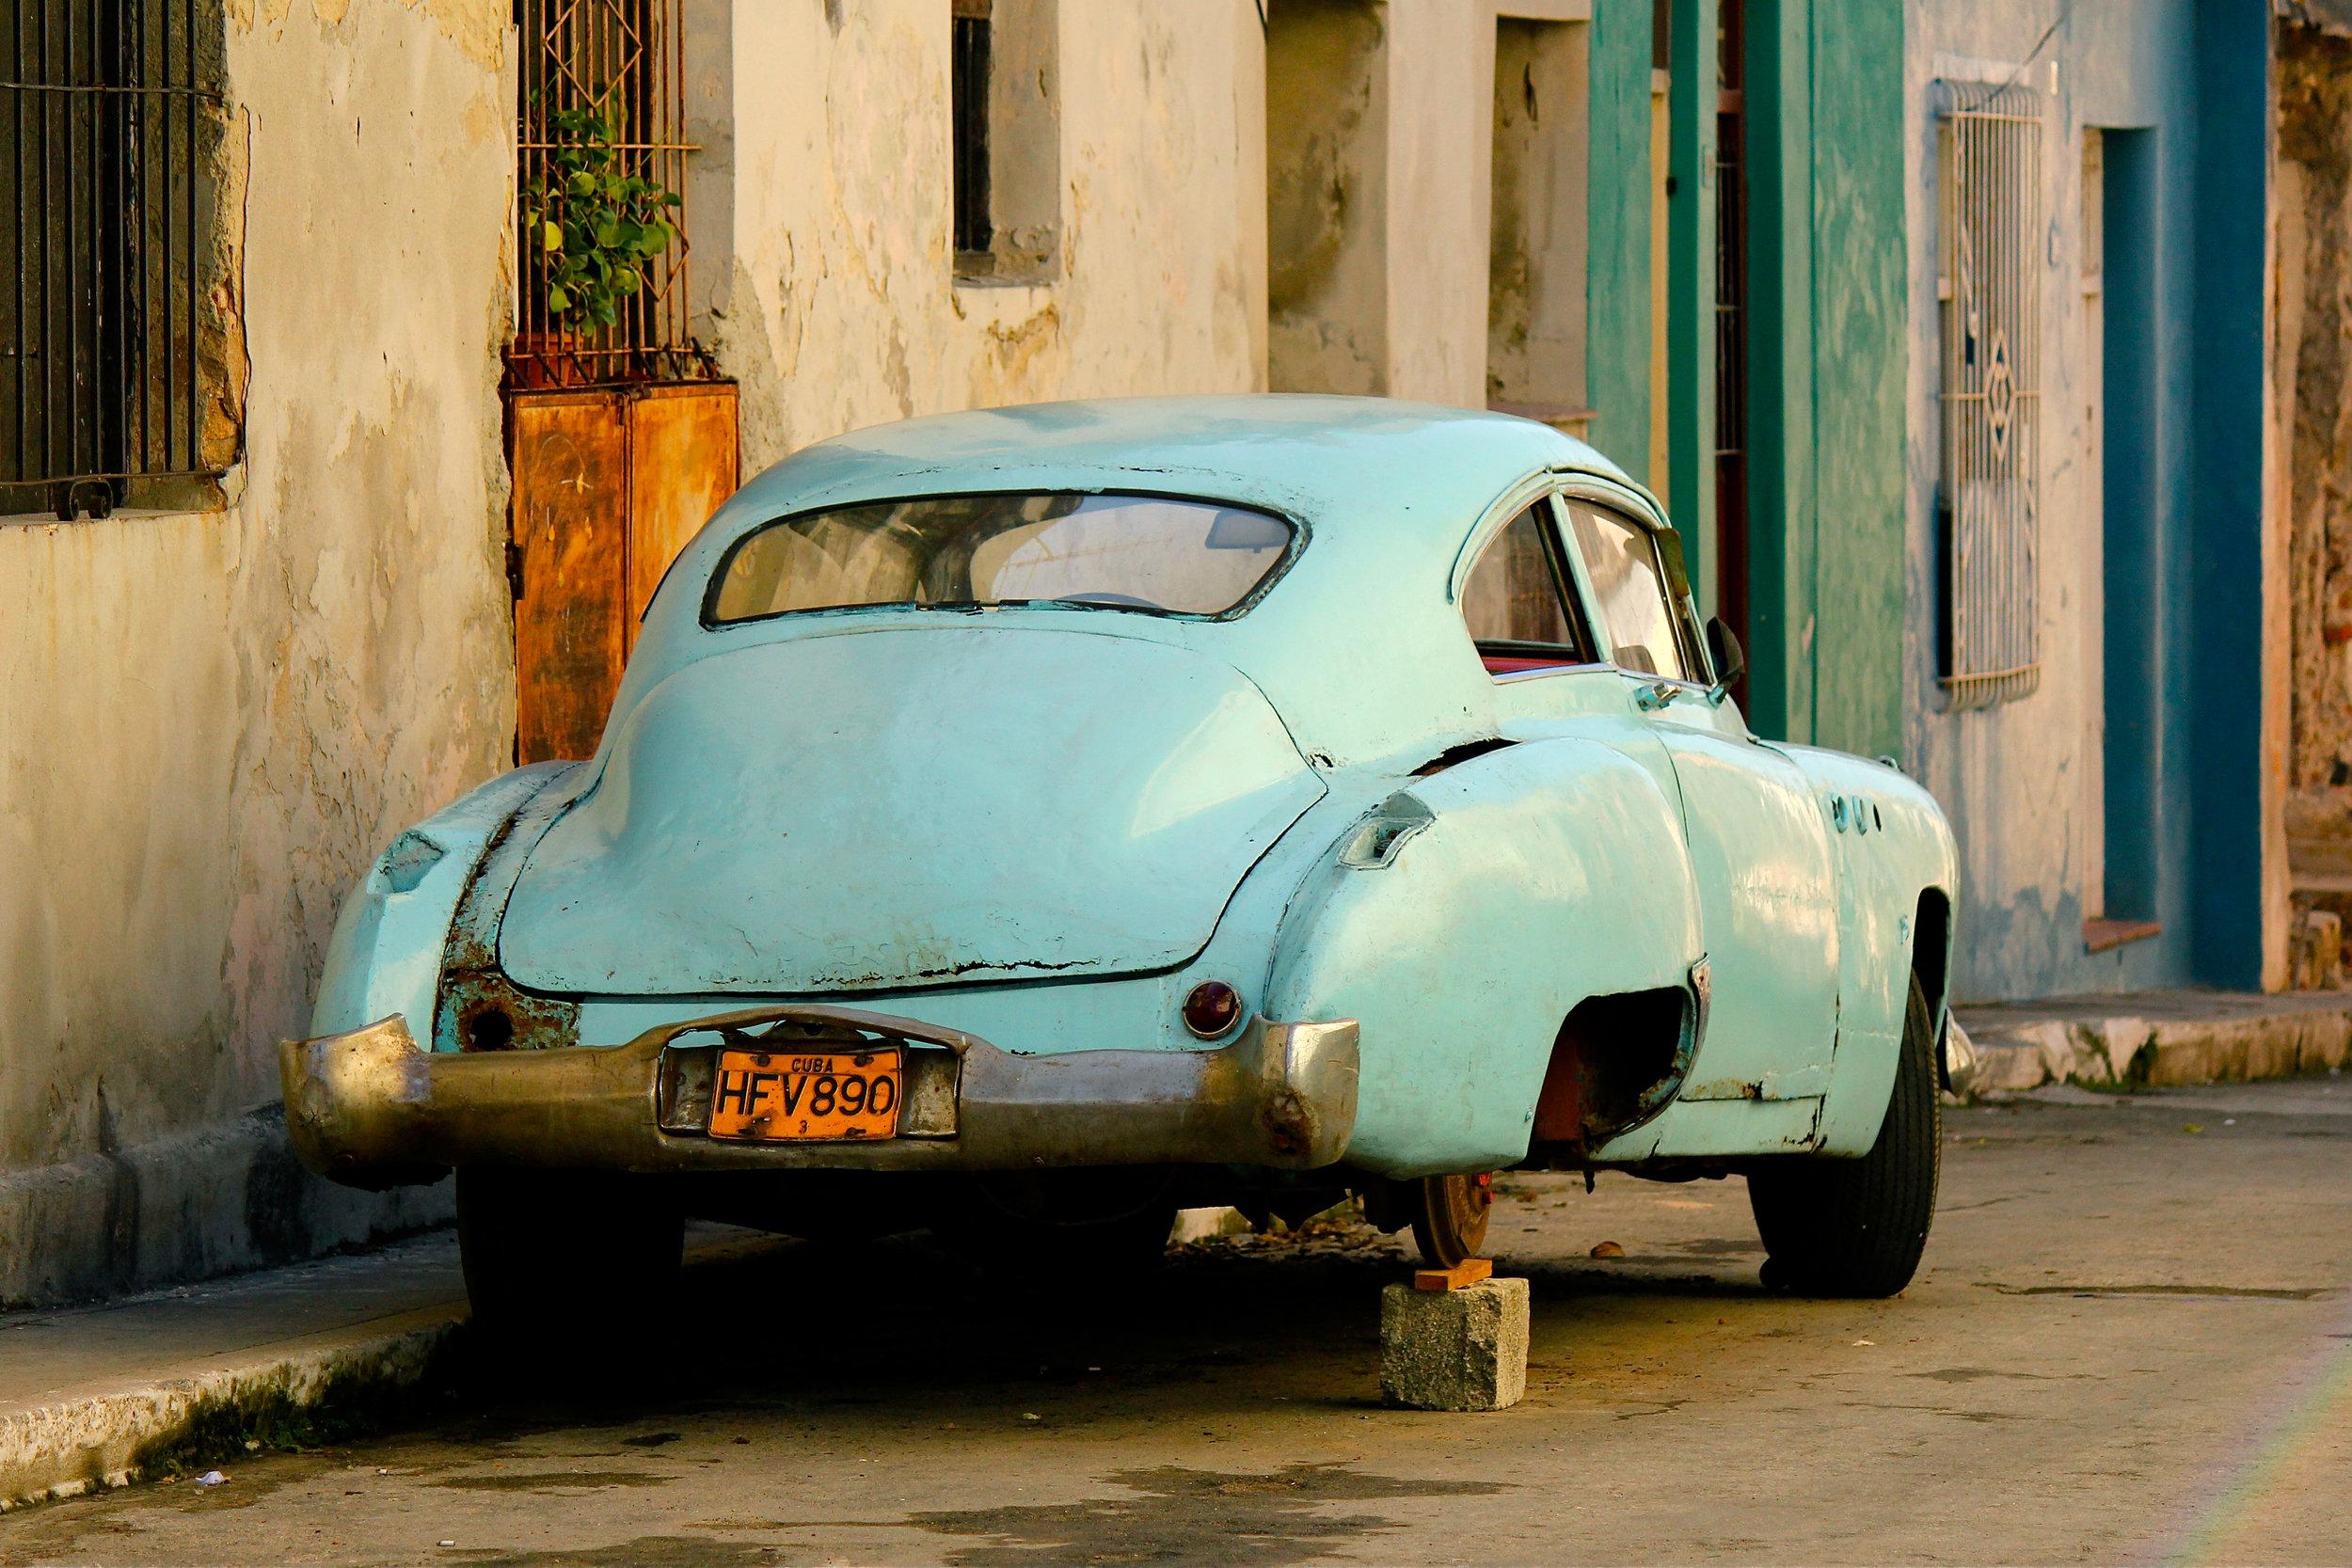 The colors of Cuba